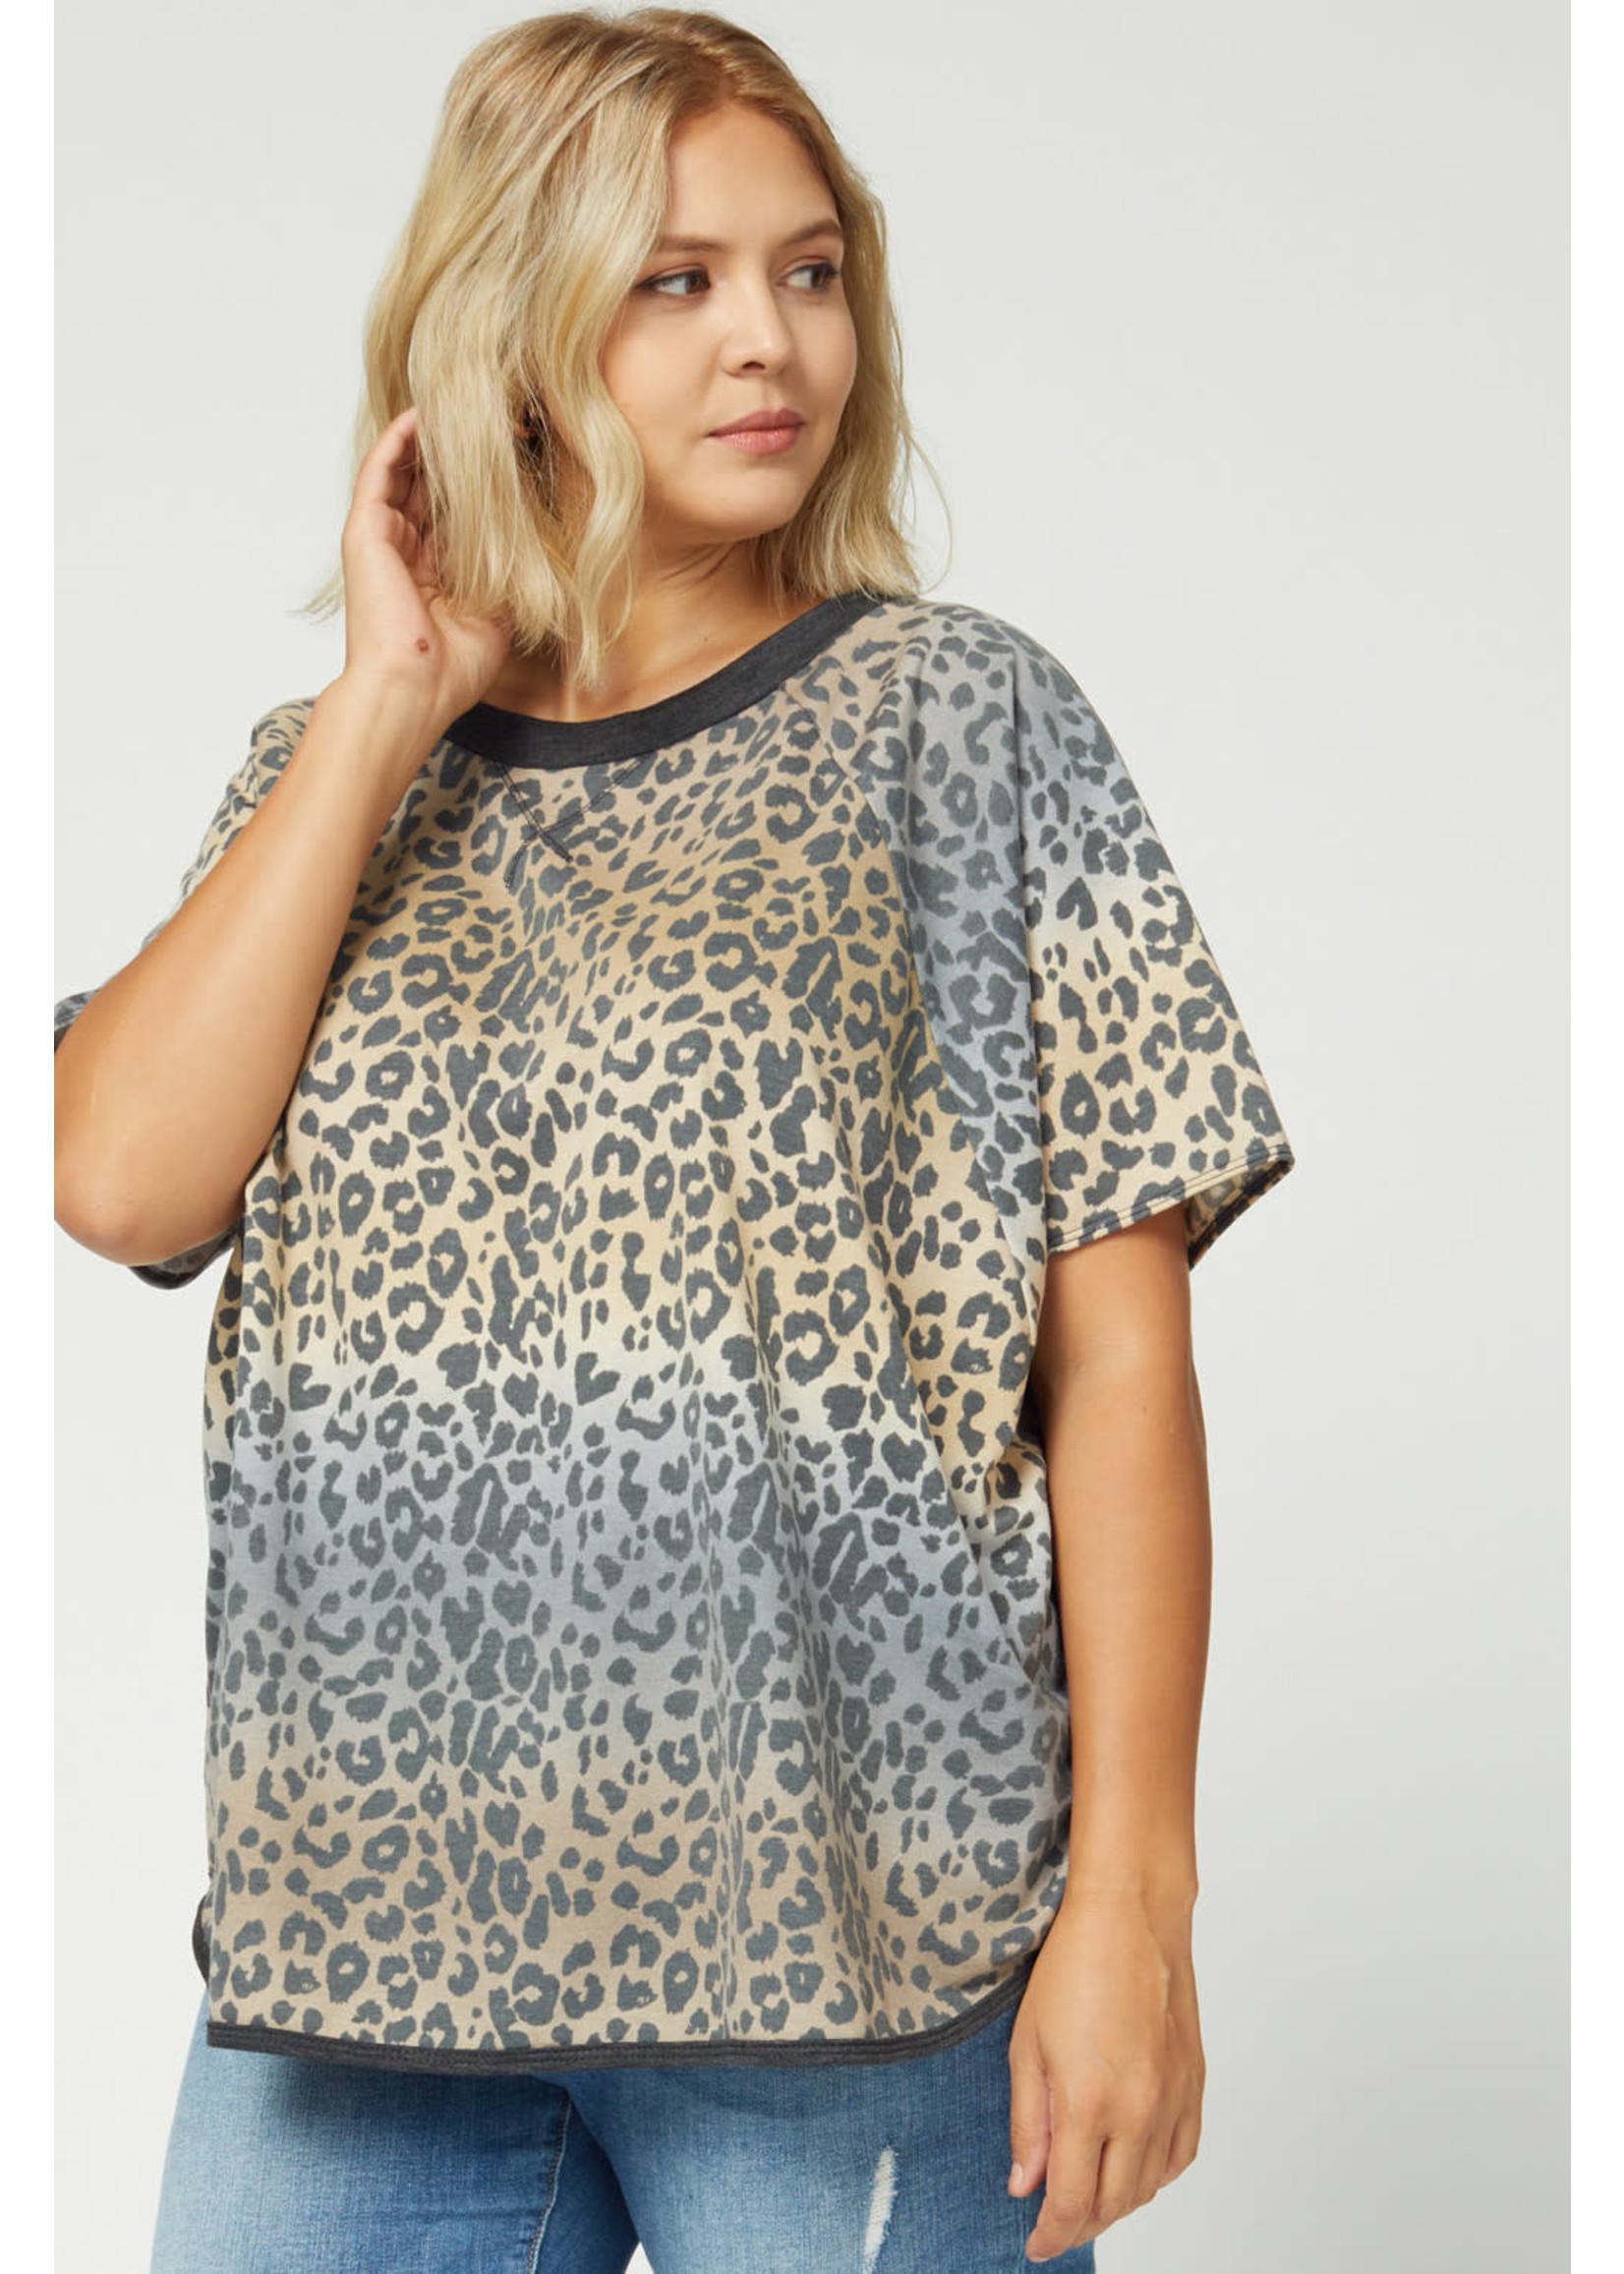 entro Leopard print round neck top